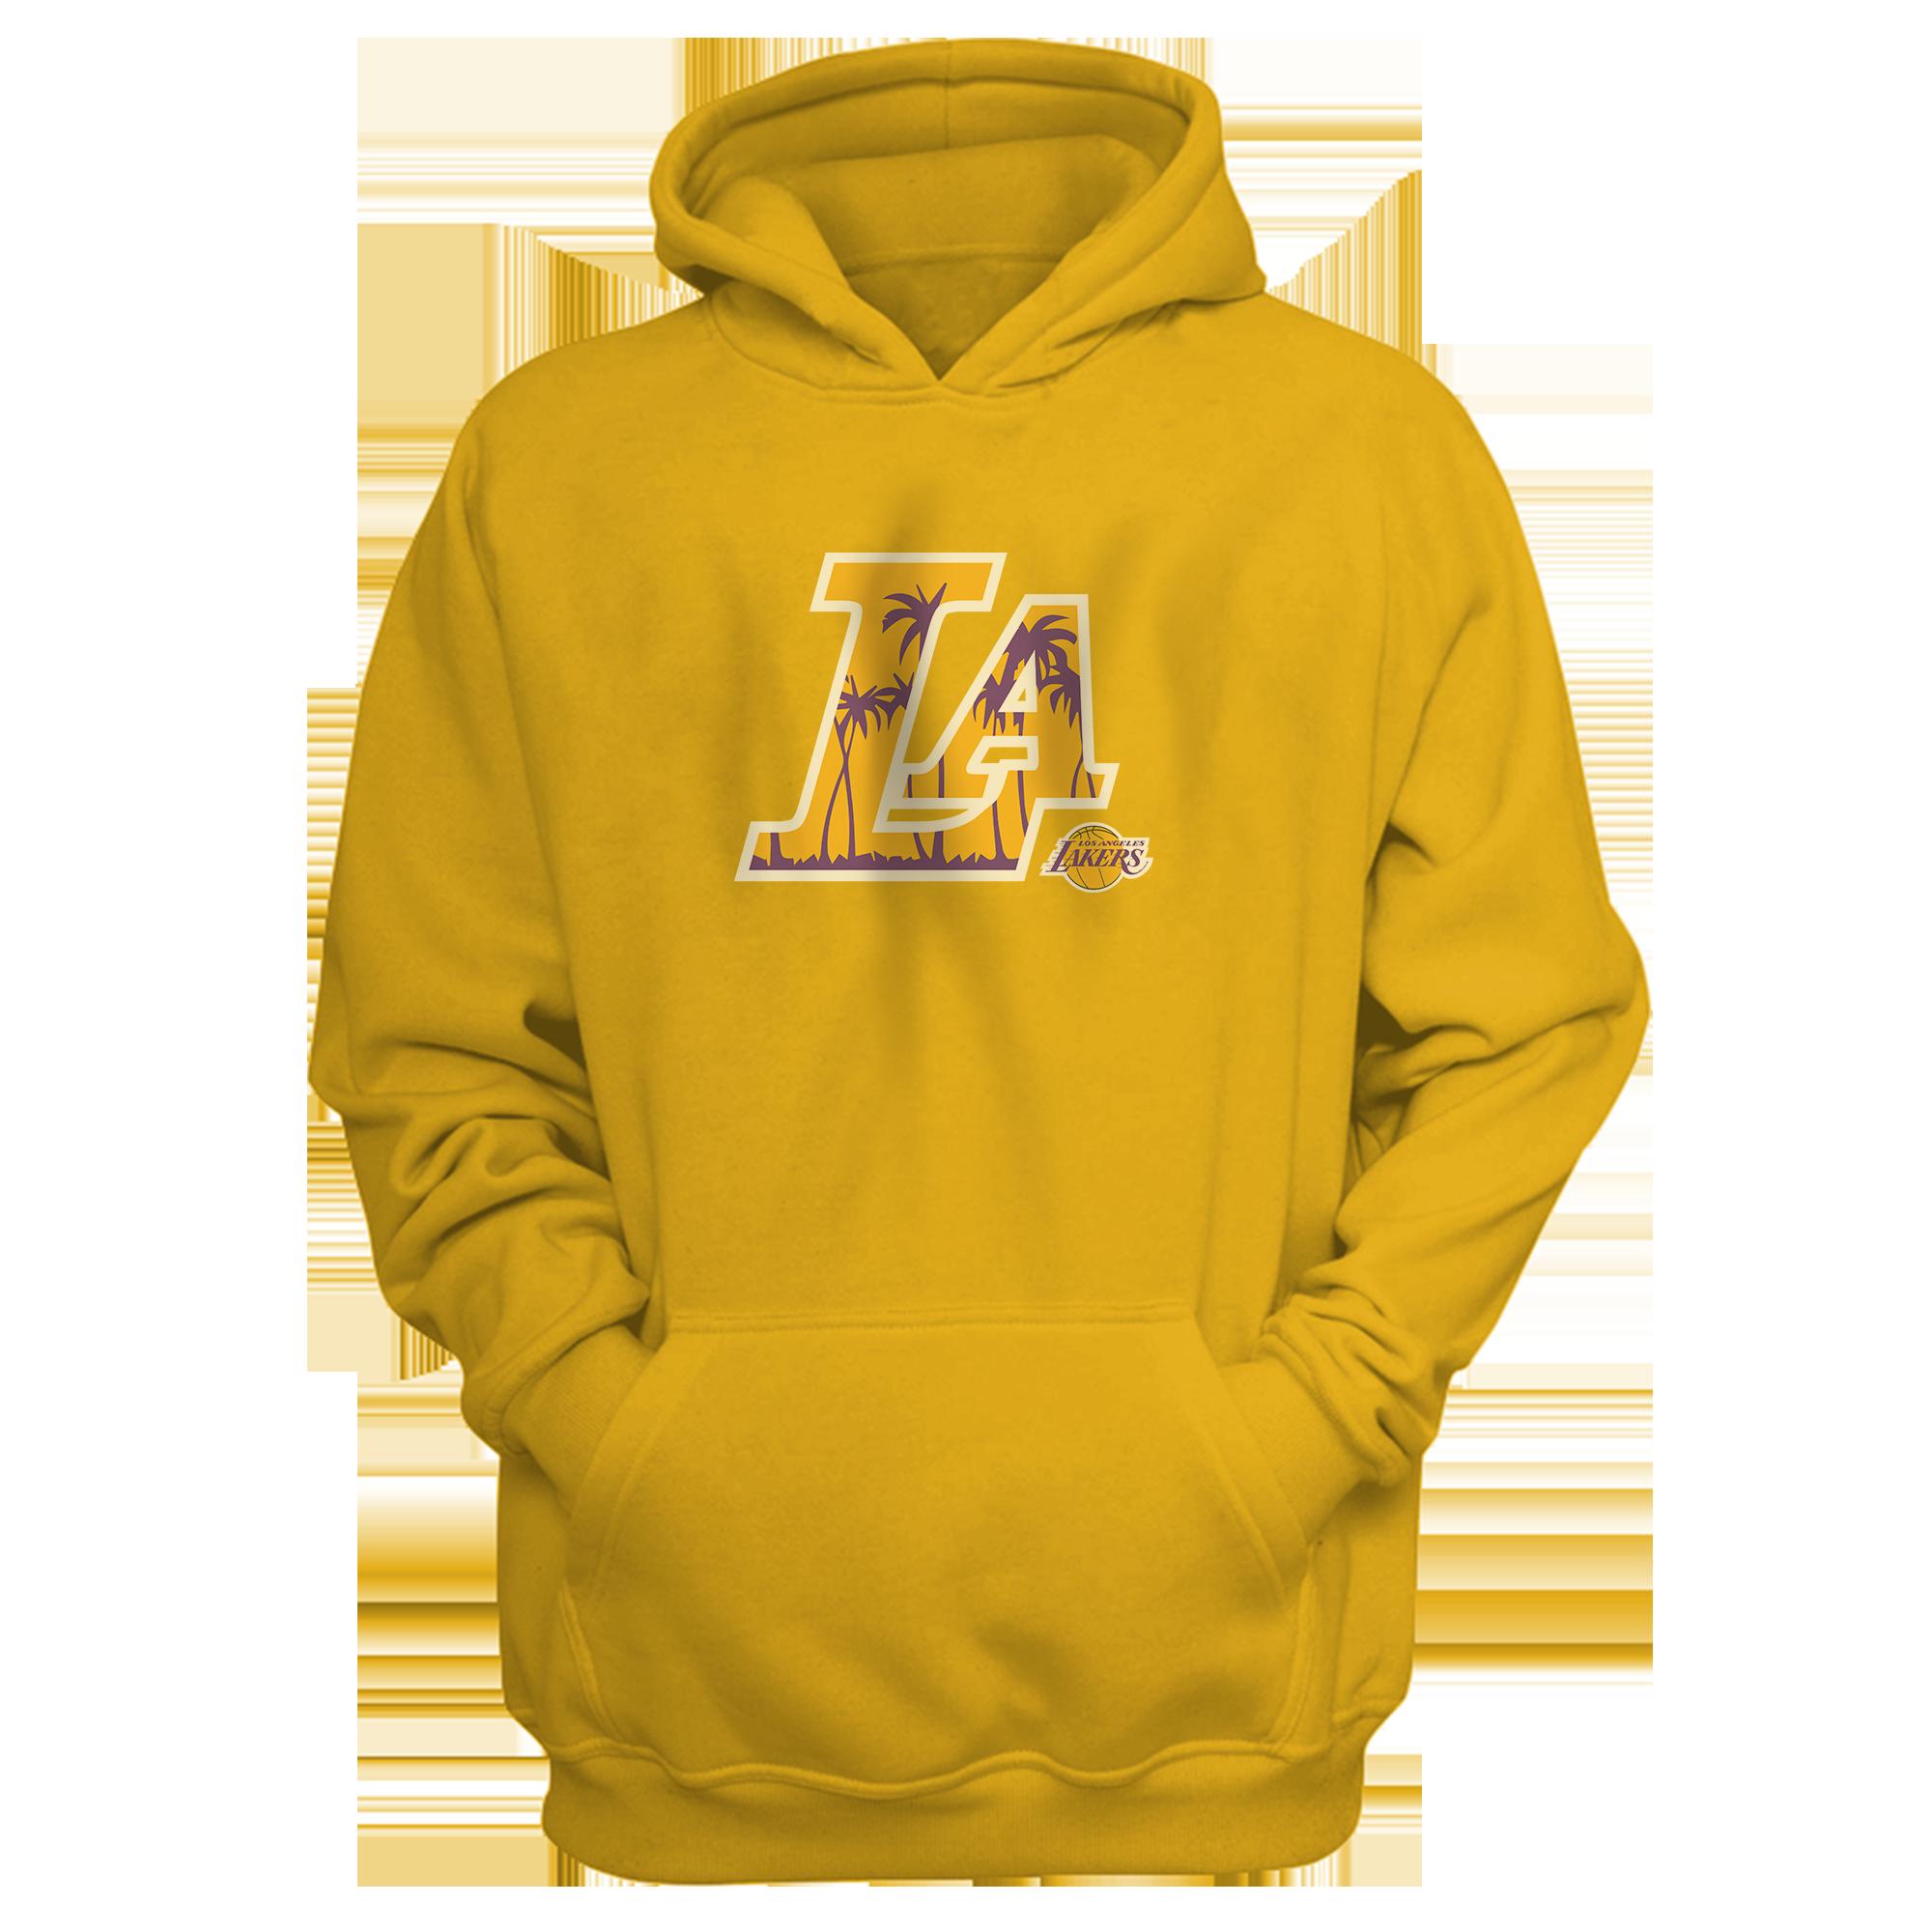 L.A. Lakers  Hoodie (HD-YLW-NP-142-NBA-LAL-L.A.)